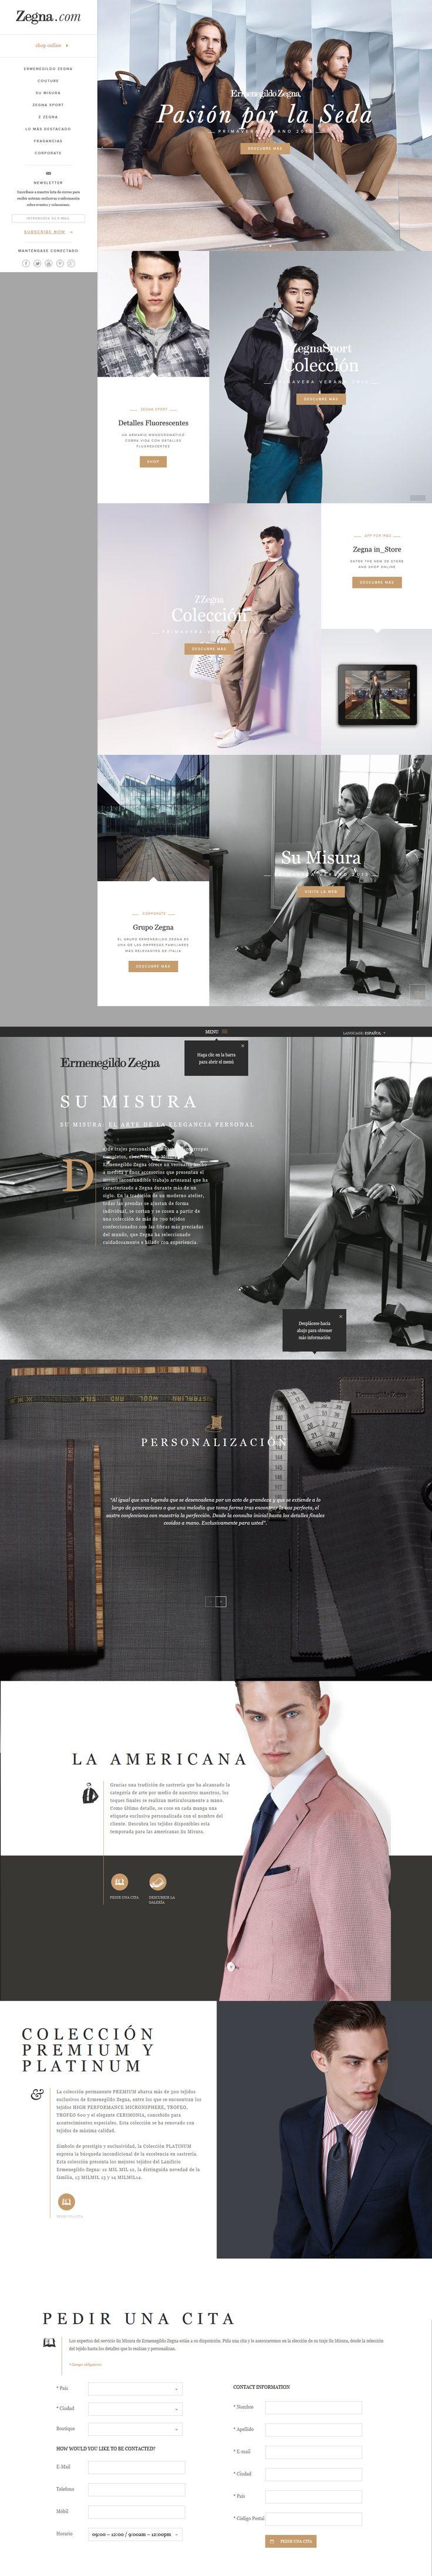 New Zegna layout. Web Graphic  Design mockup. Fashion E-Commerce.